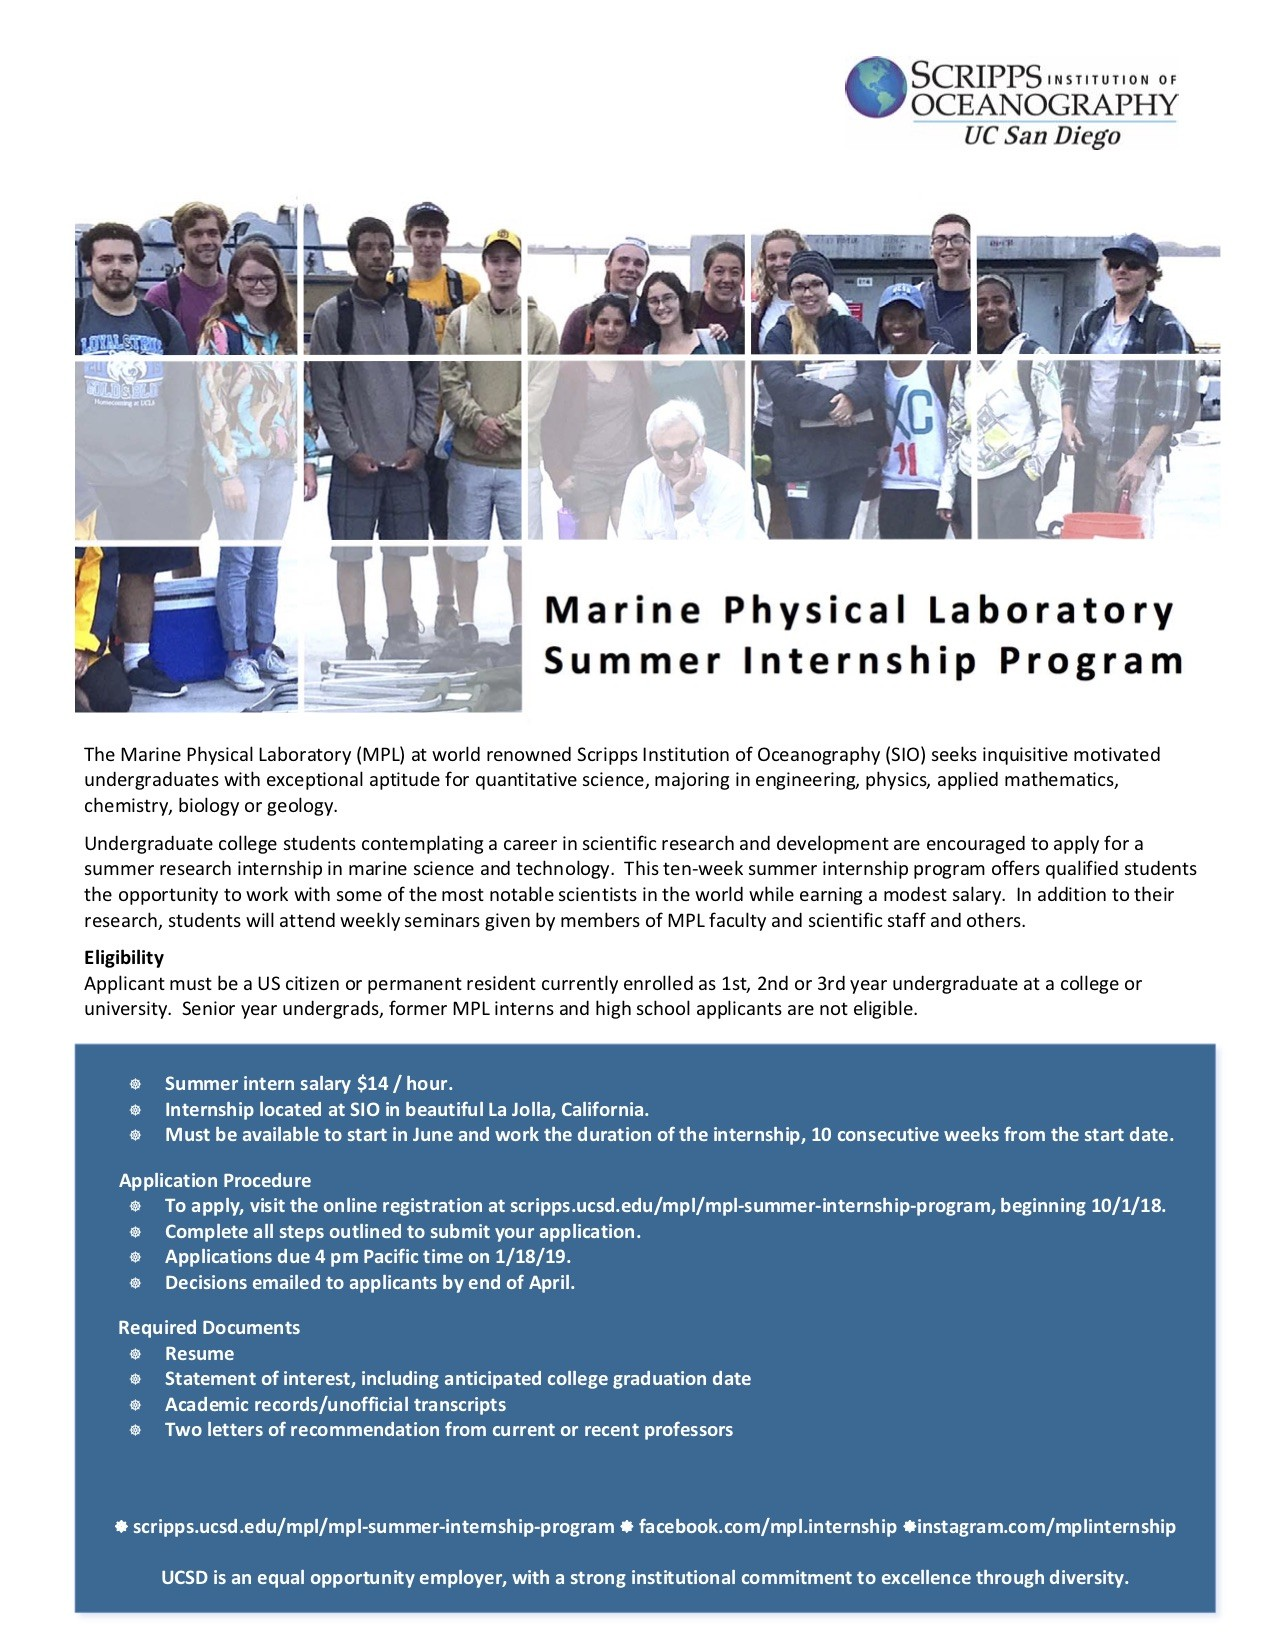 2019 Summer Internship at UCSD/Scripps Institution of Oceanography